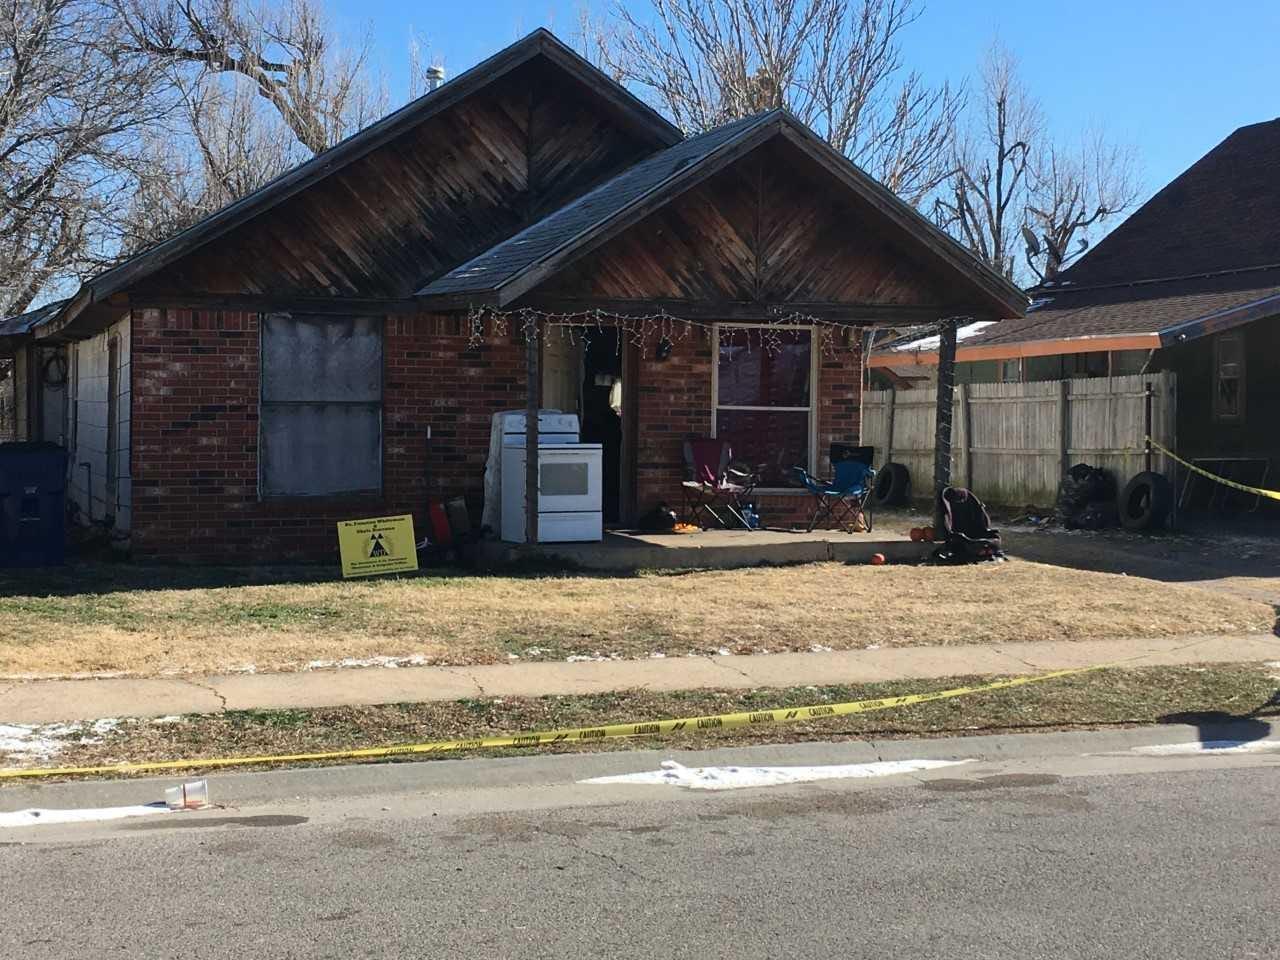 3 El Reno Children Die In New Year's Day House Fire